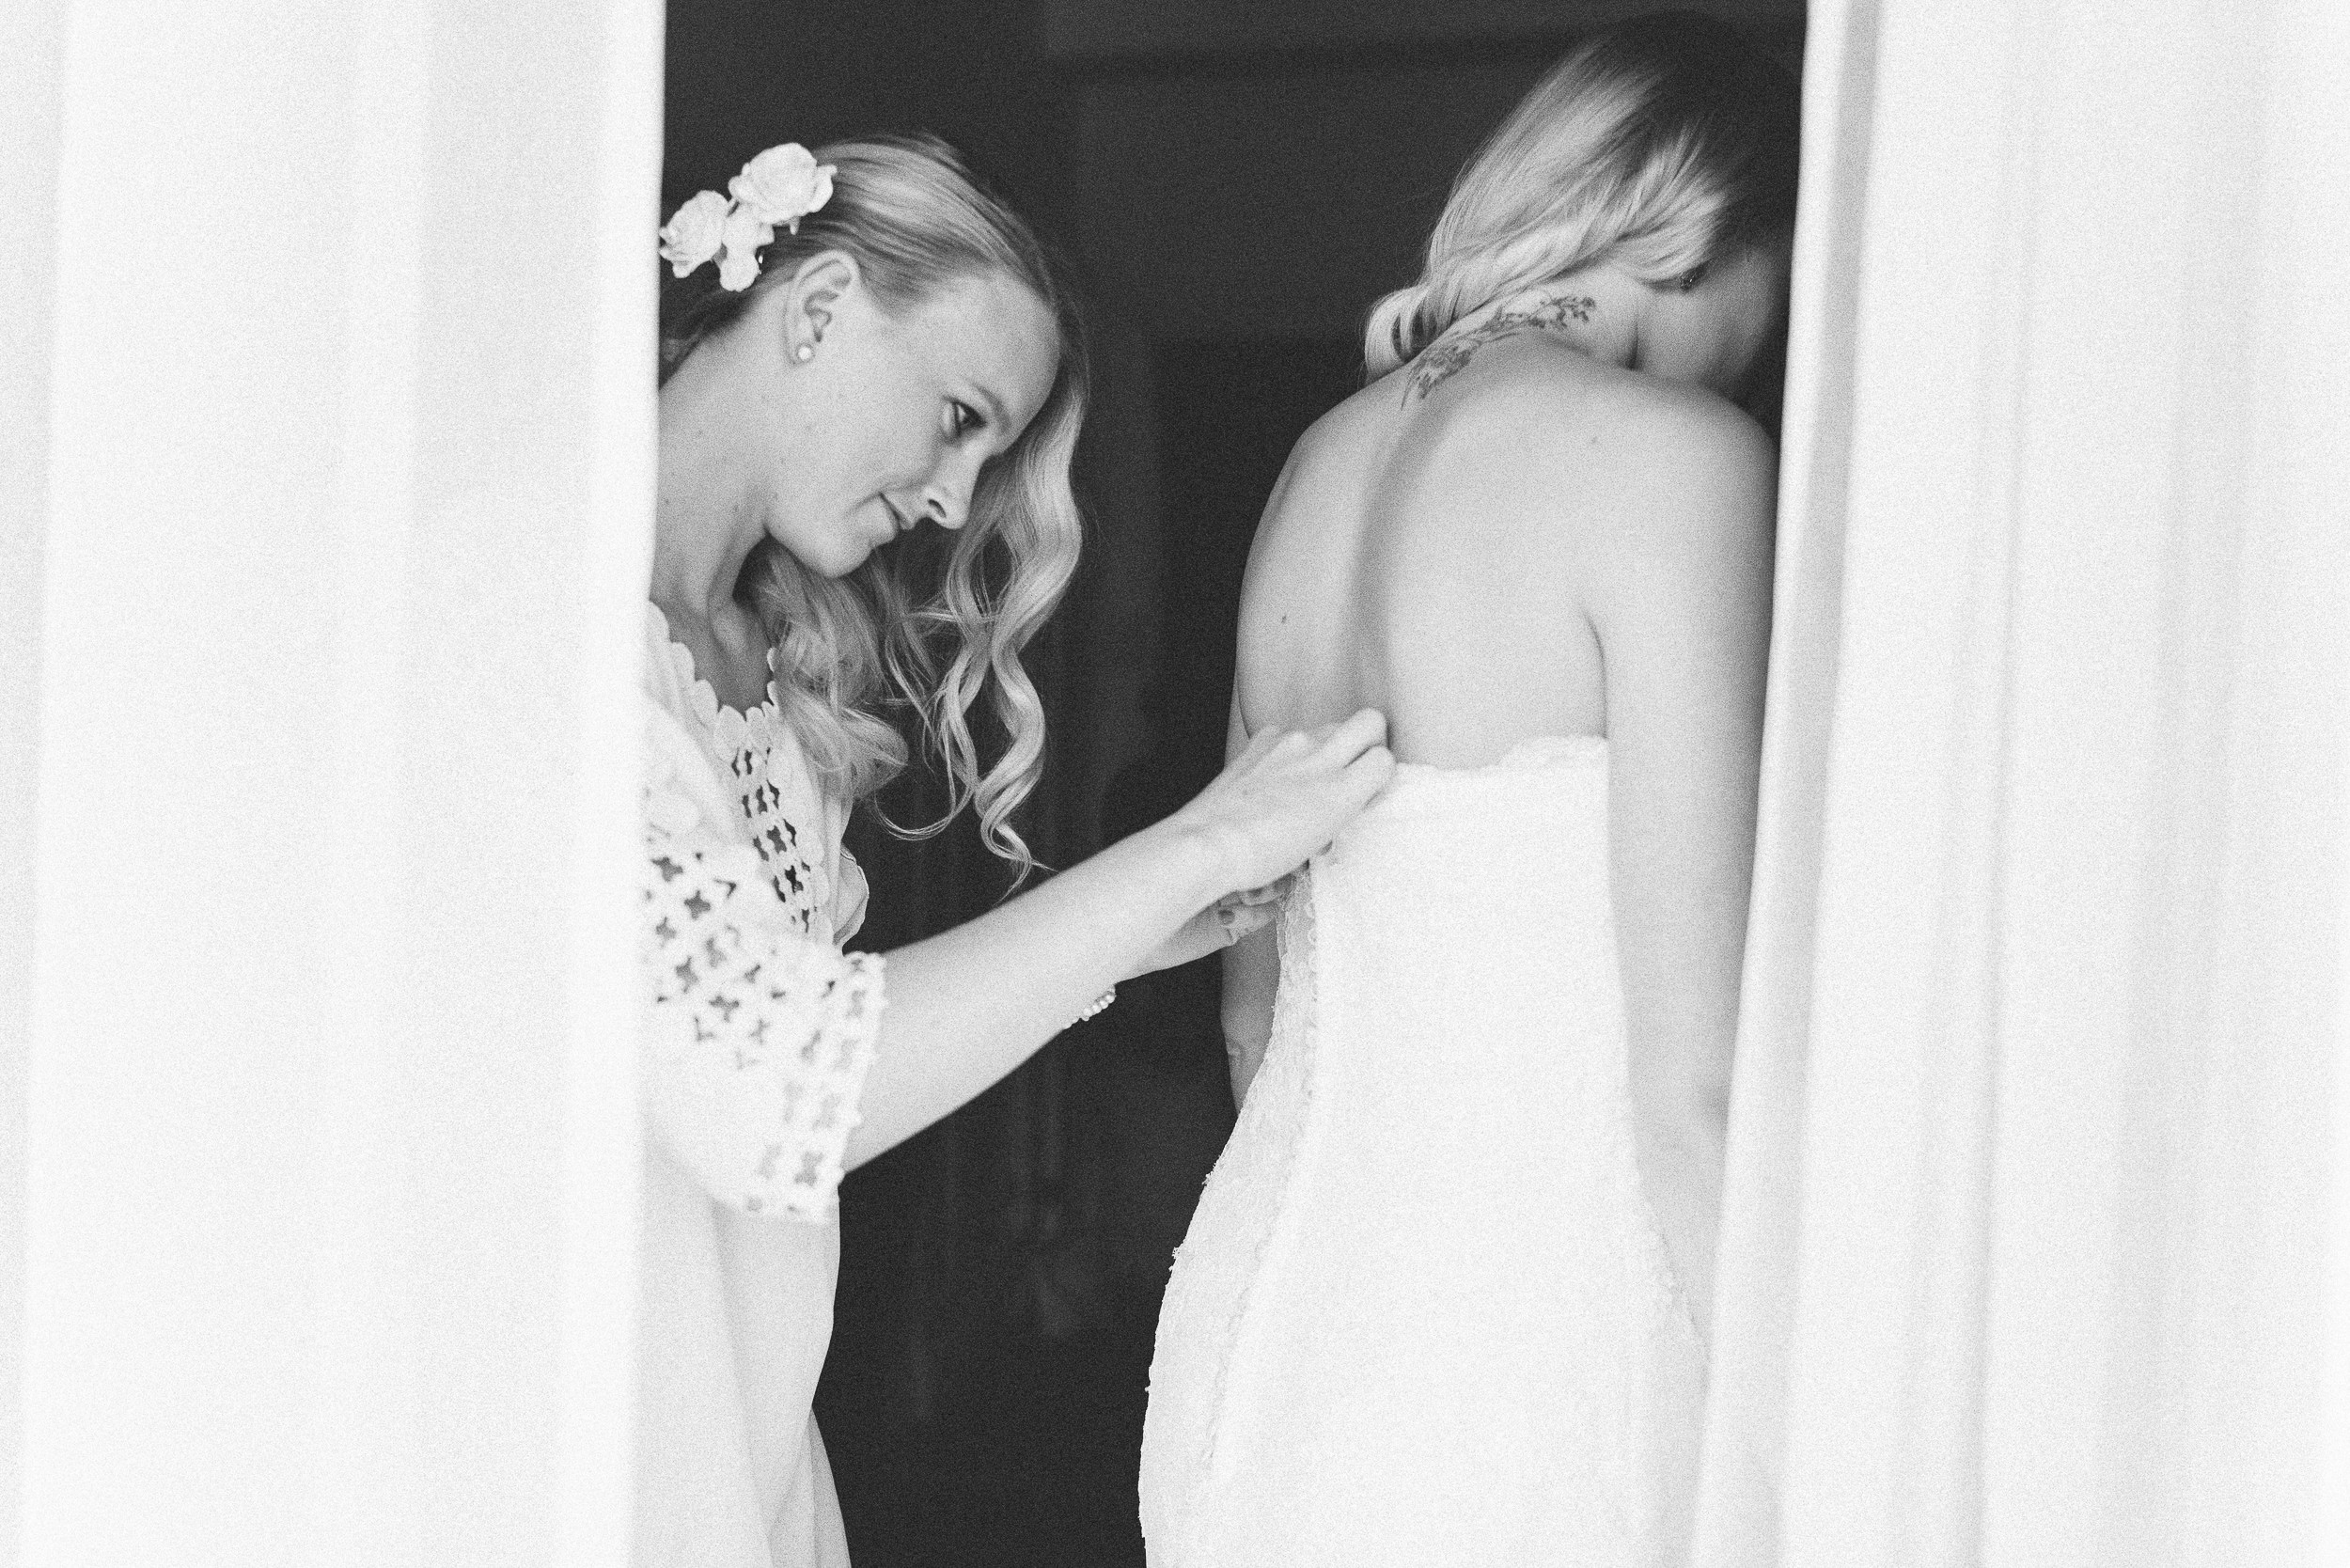 New-Zealand-Wedding-Photographer-3.jpg